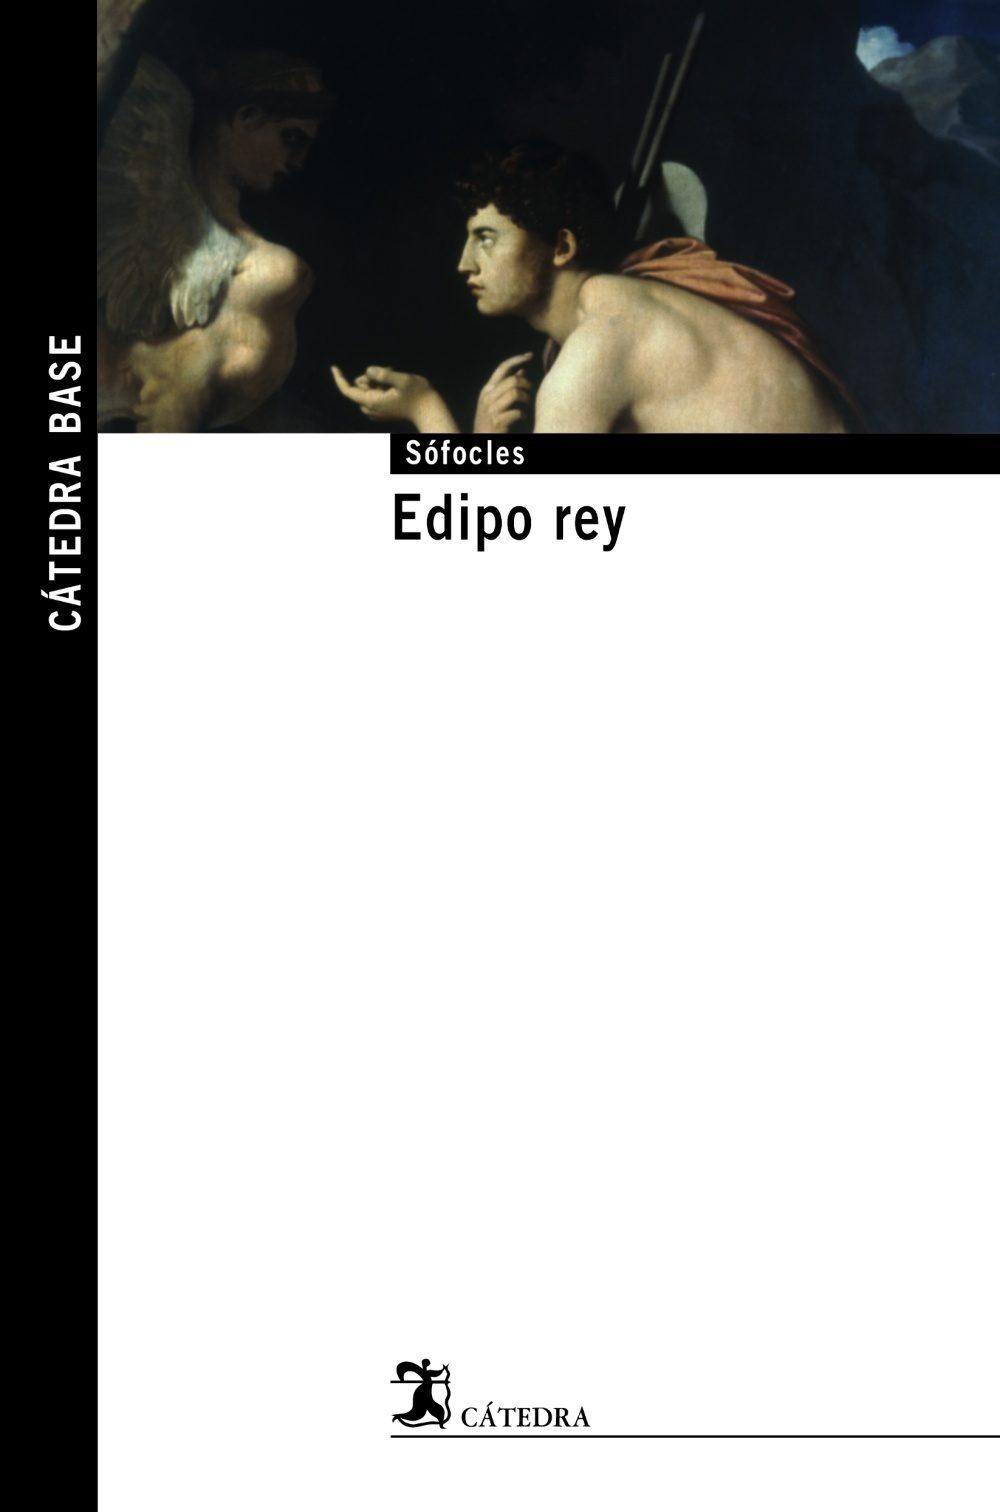 Edipo rey; sófocles